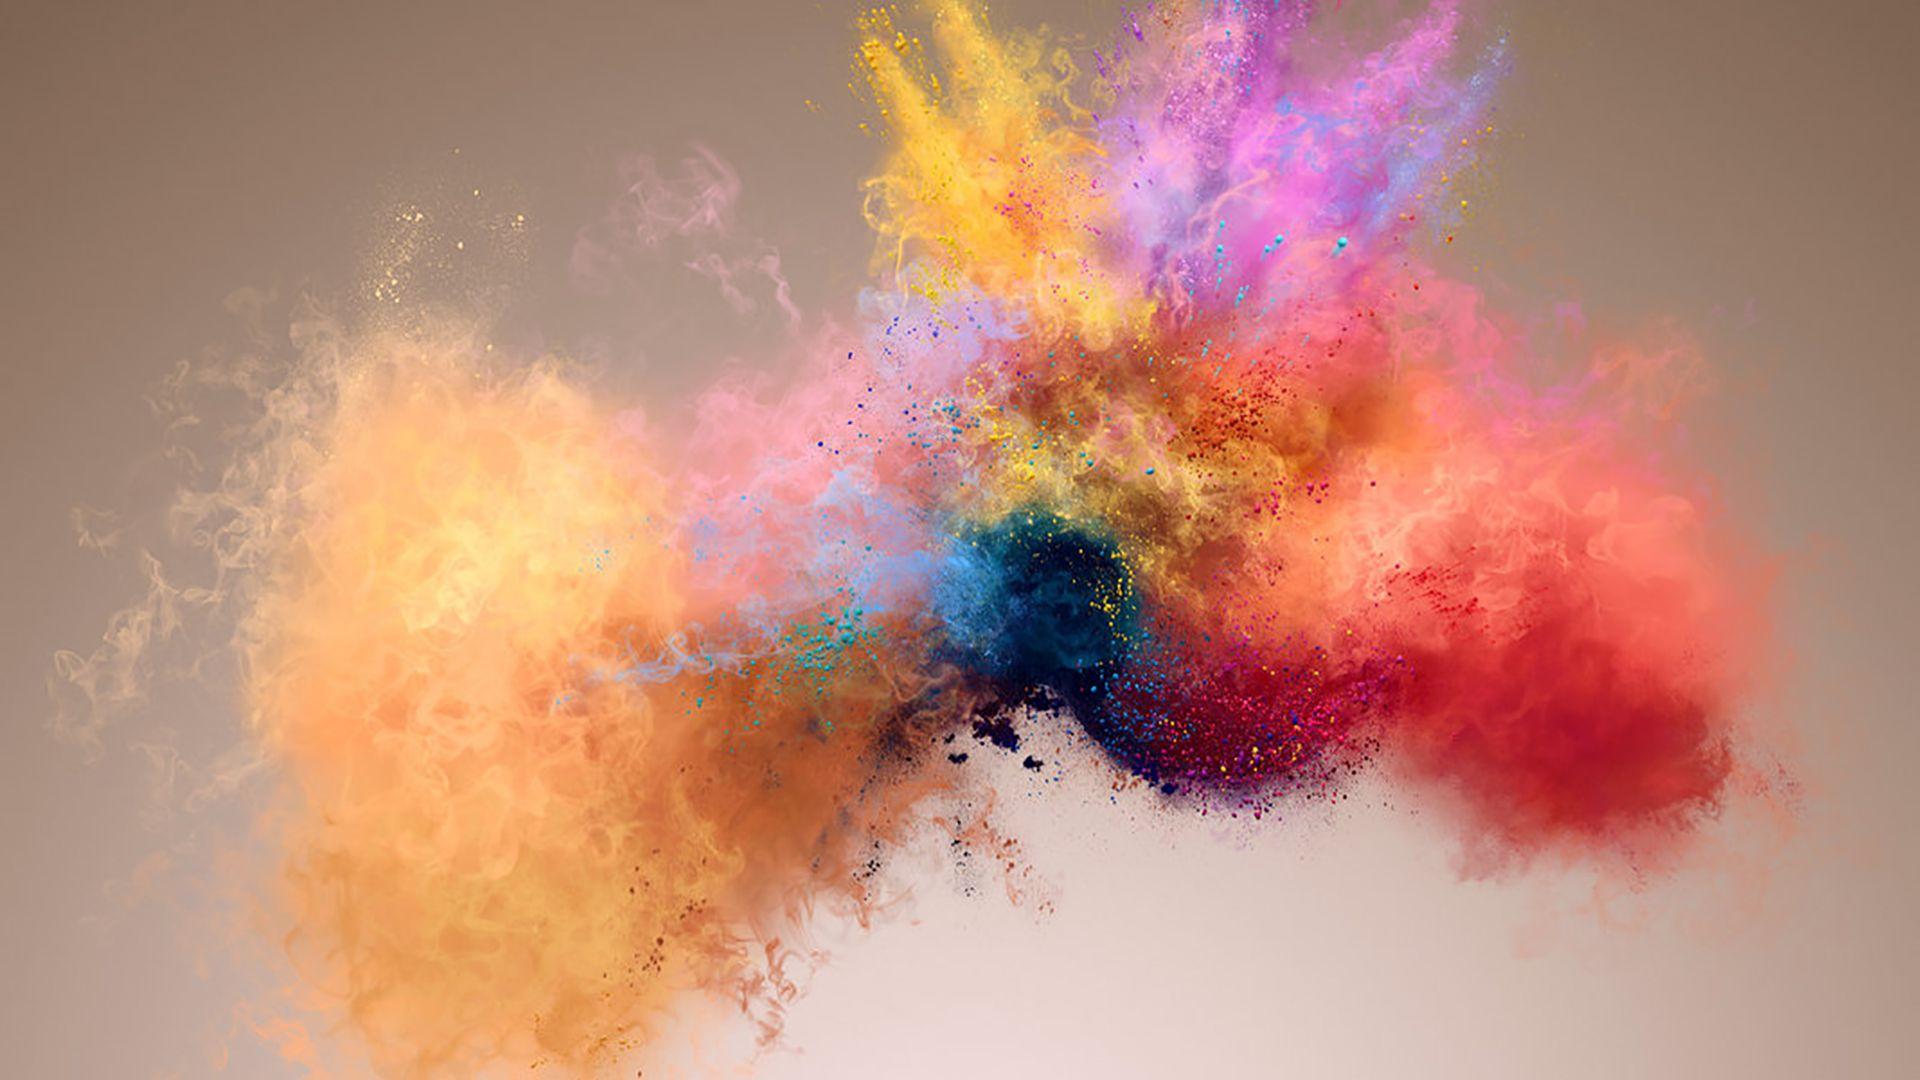 Rainbow HD 1080 wallpaper